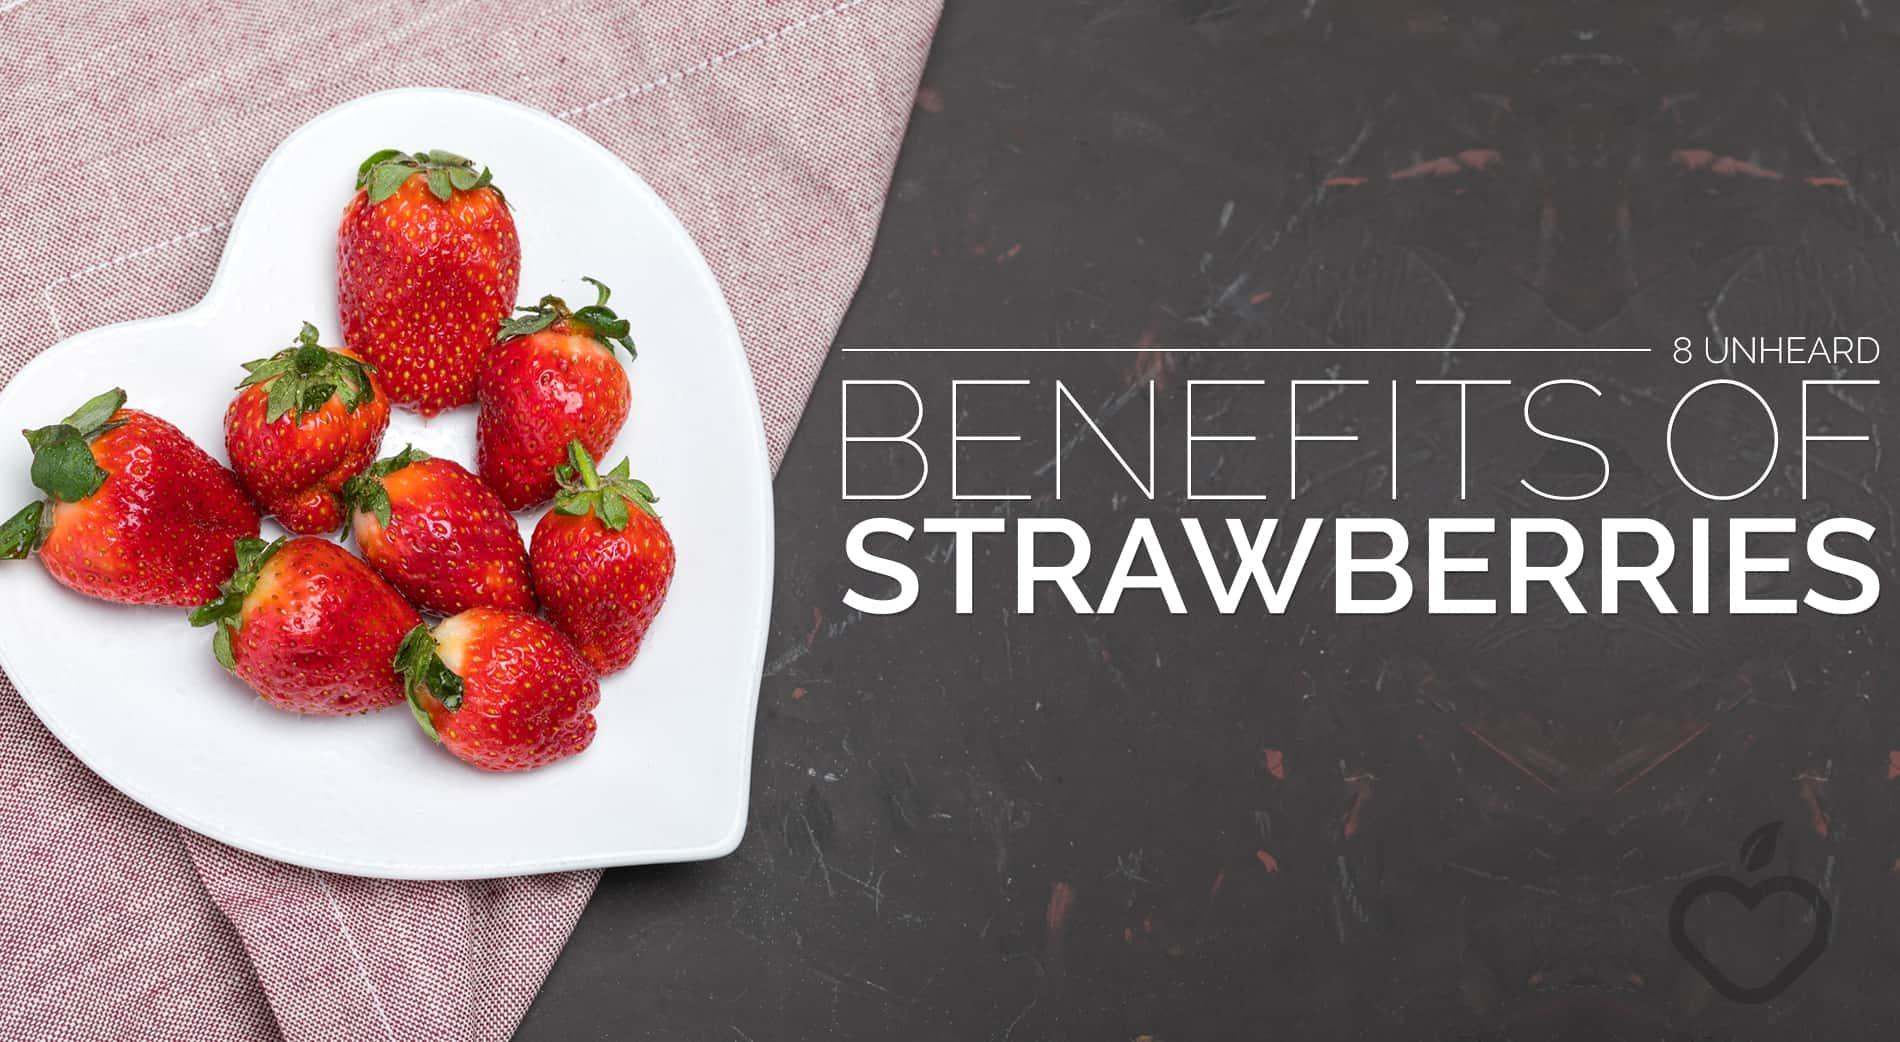 Strawberries Image Design 1 - 8 Unheard Benefits of Strawberries